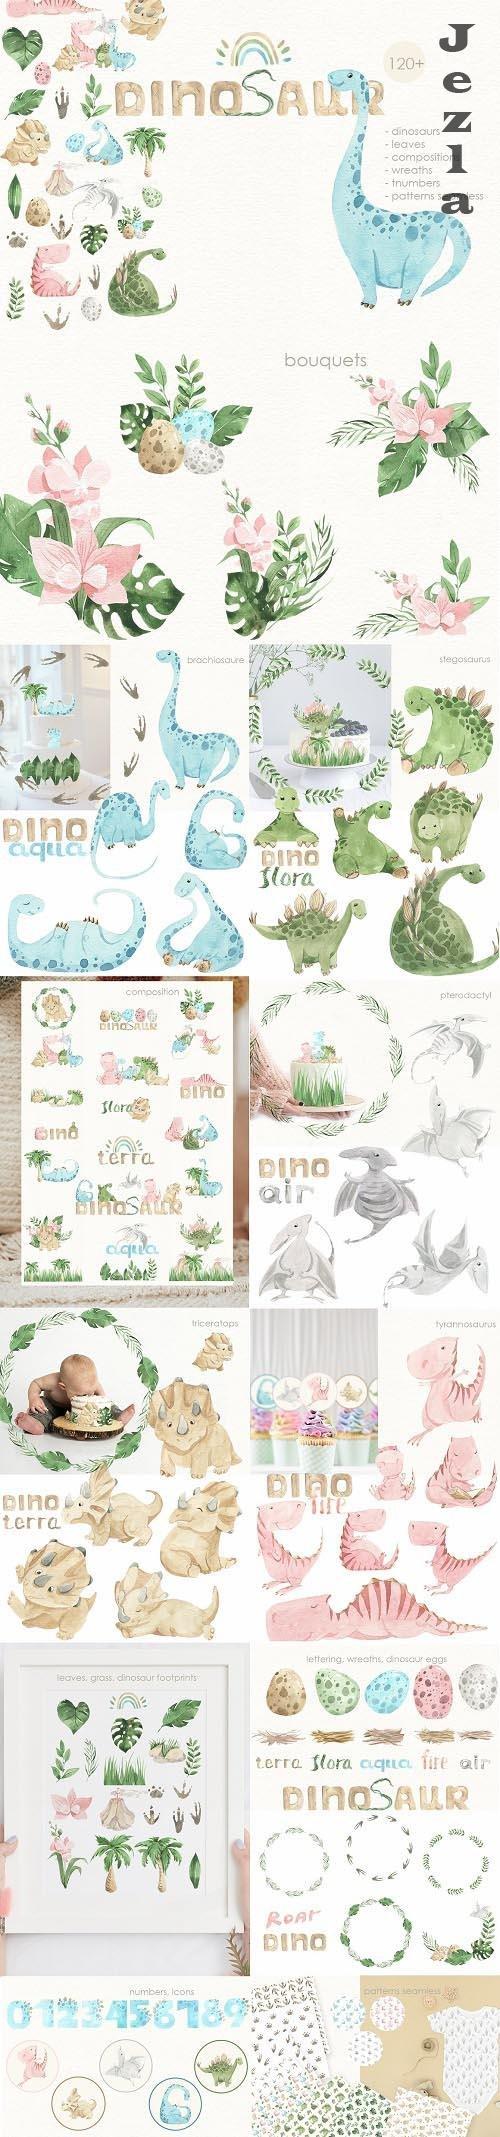 Dinosaurs cute illustration - 1480593